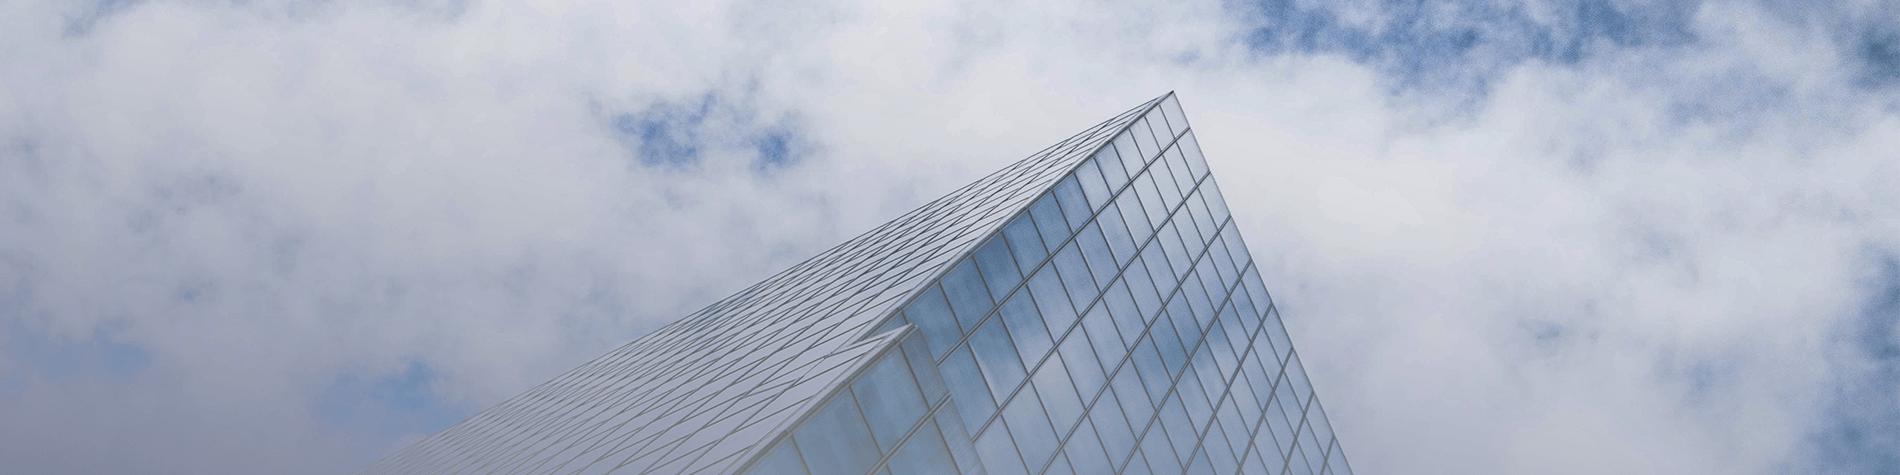 economical advantages of photovoltaic glass